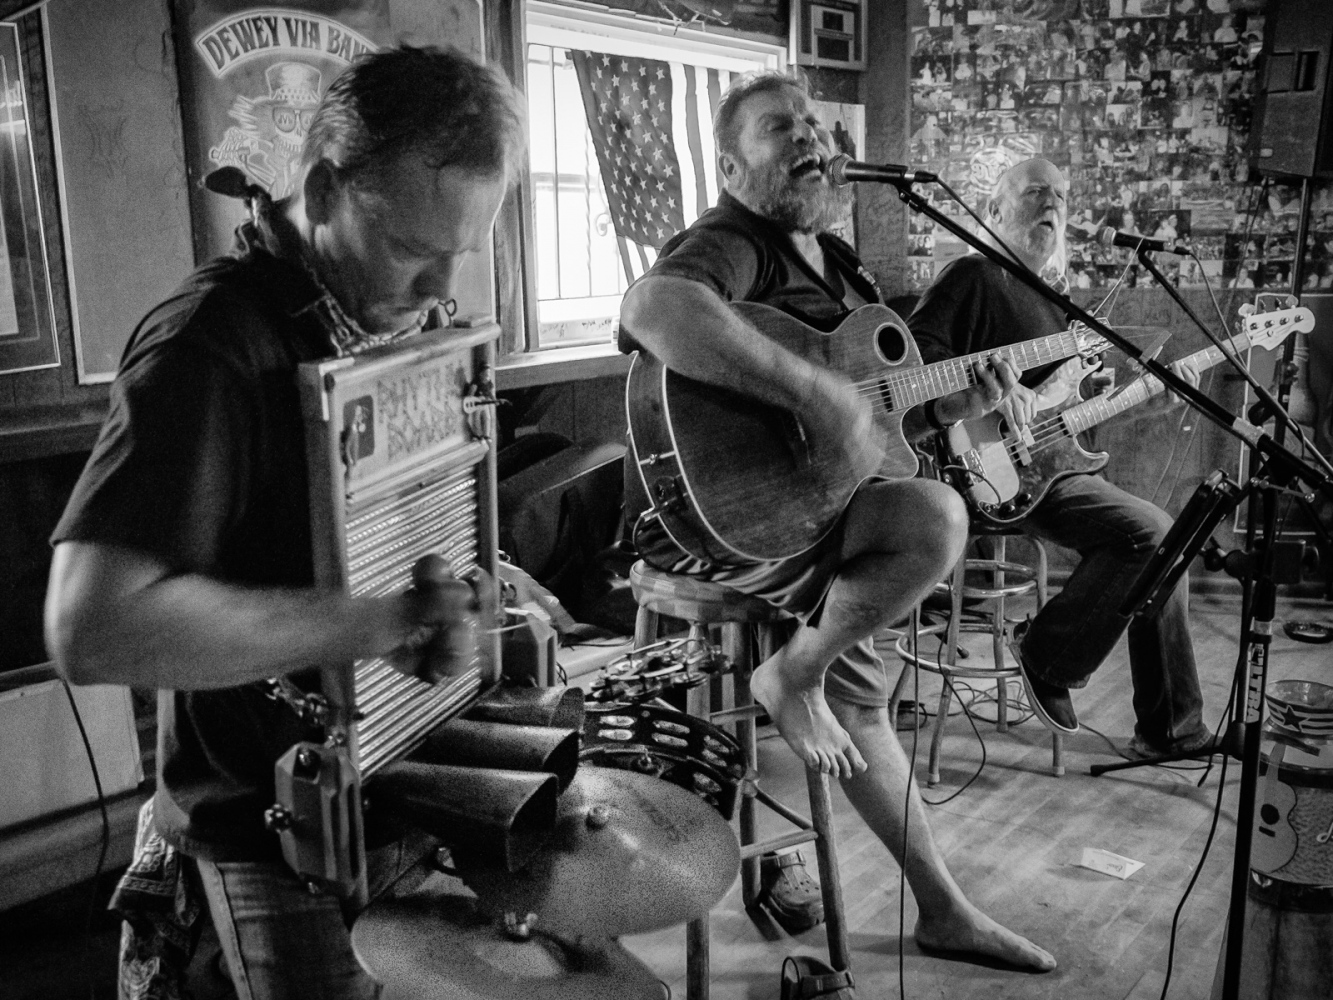 Dewy Via Band Cabbage Patch Bar, Sansula, FL